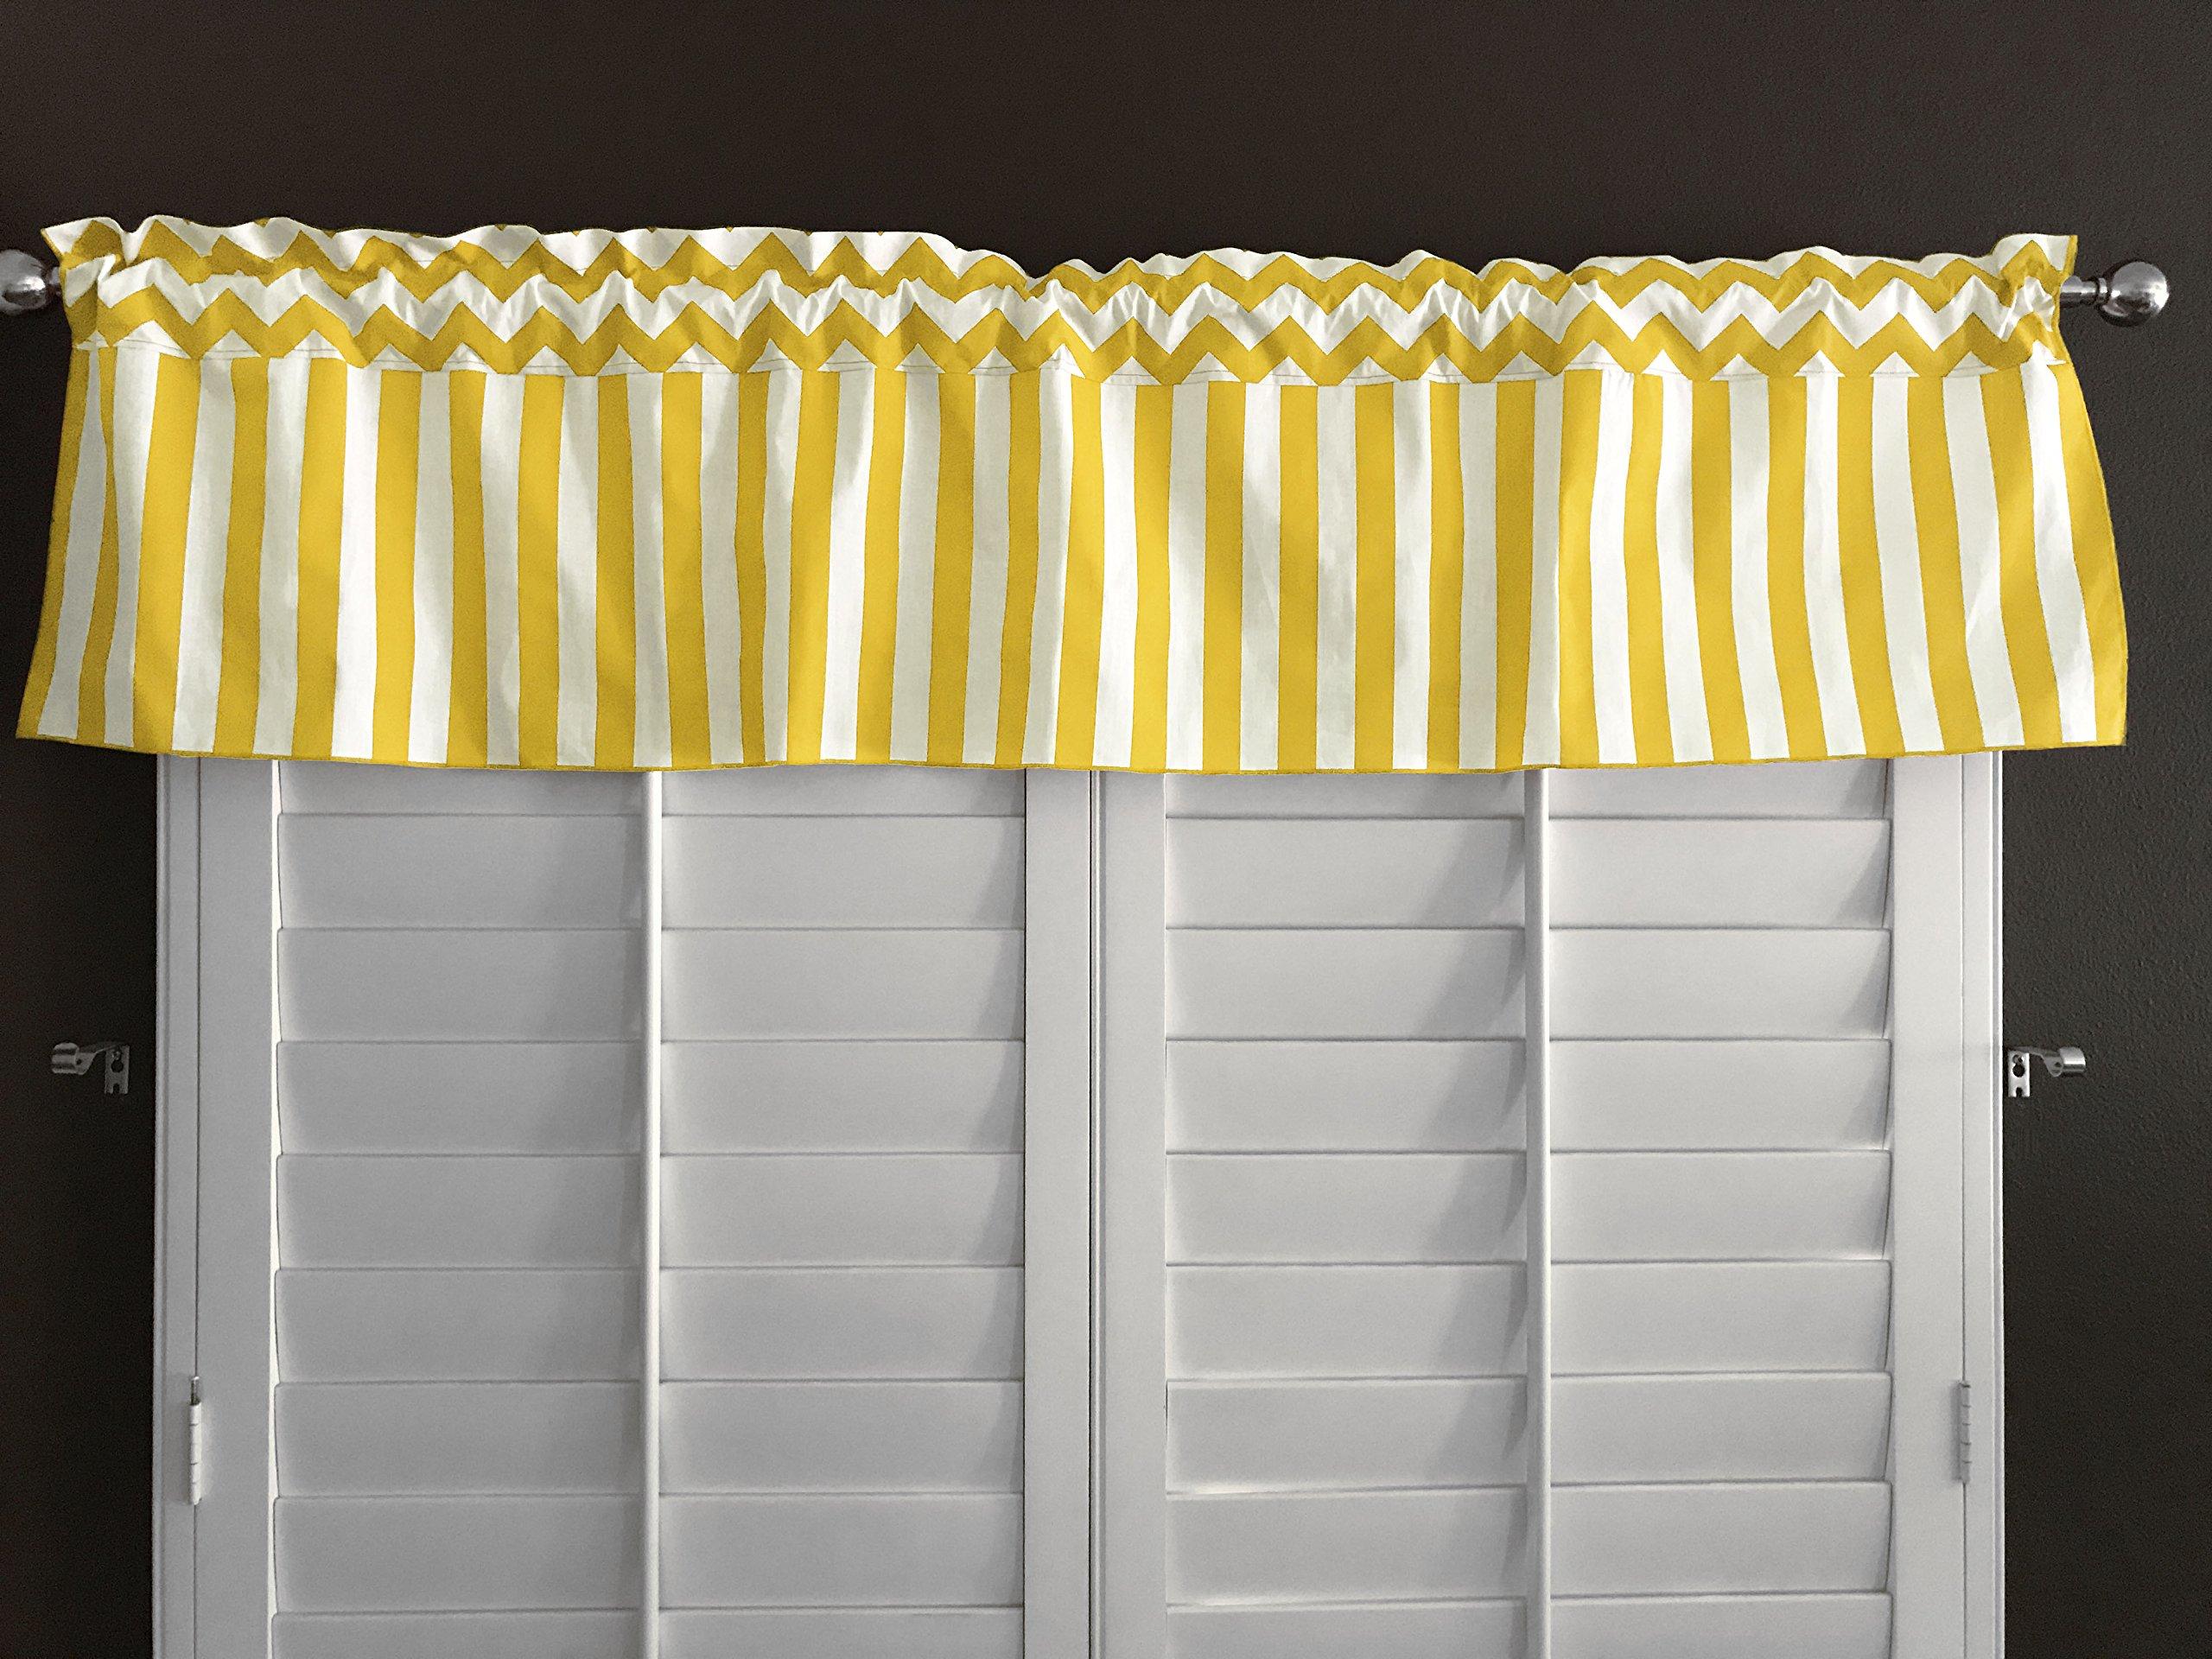 Zen Creative Designs Yellow Chevron Rain Cotton Stripes Window Valance 58 Inch Wide (28'' Tall) by Zen Creative Designs